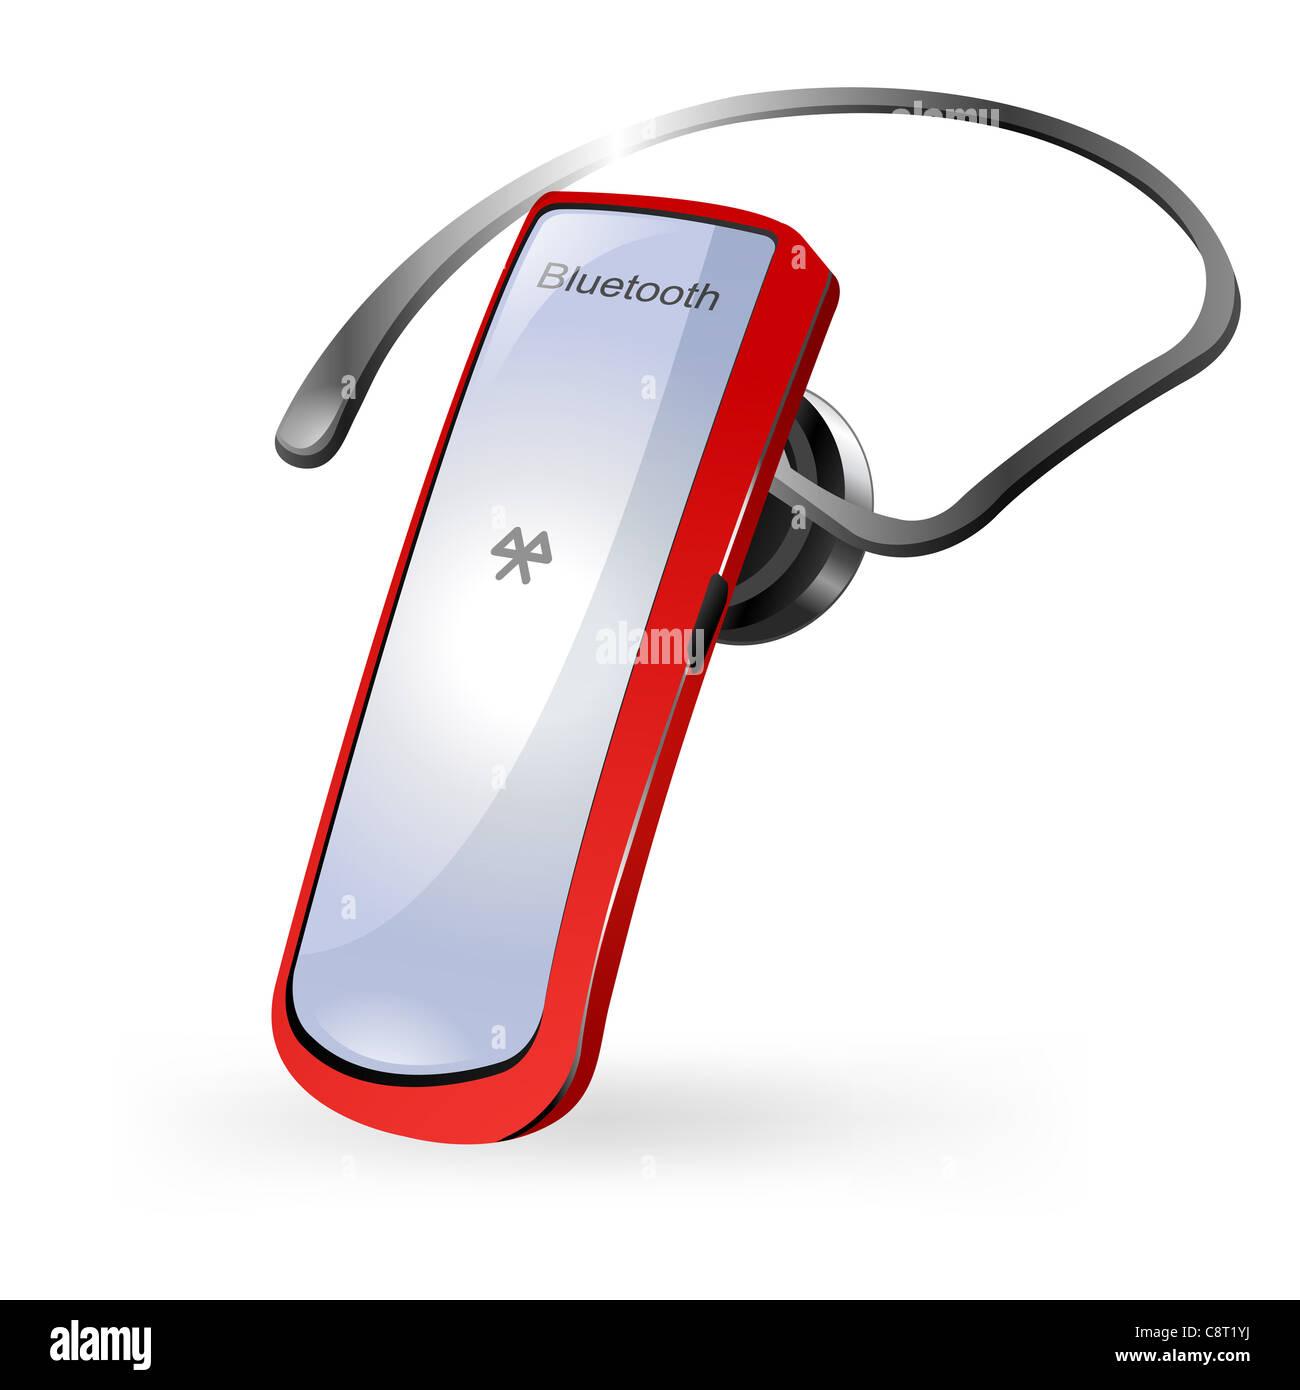 Bluetooth Symbol Stock Photos Bluetooth Symbol Stock Images Alamy